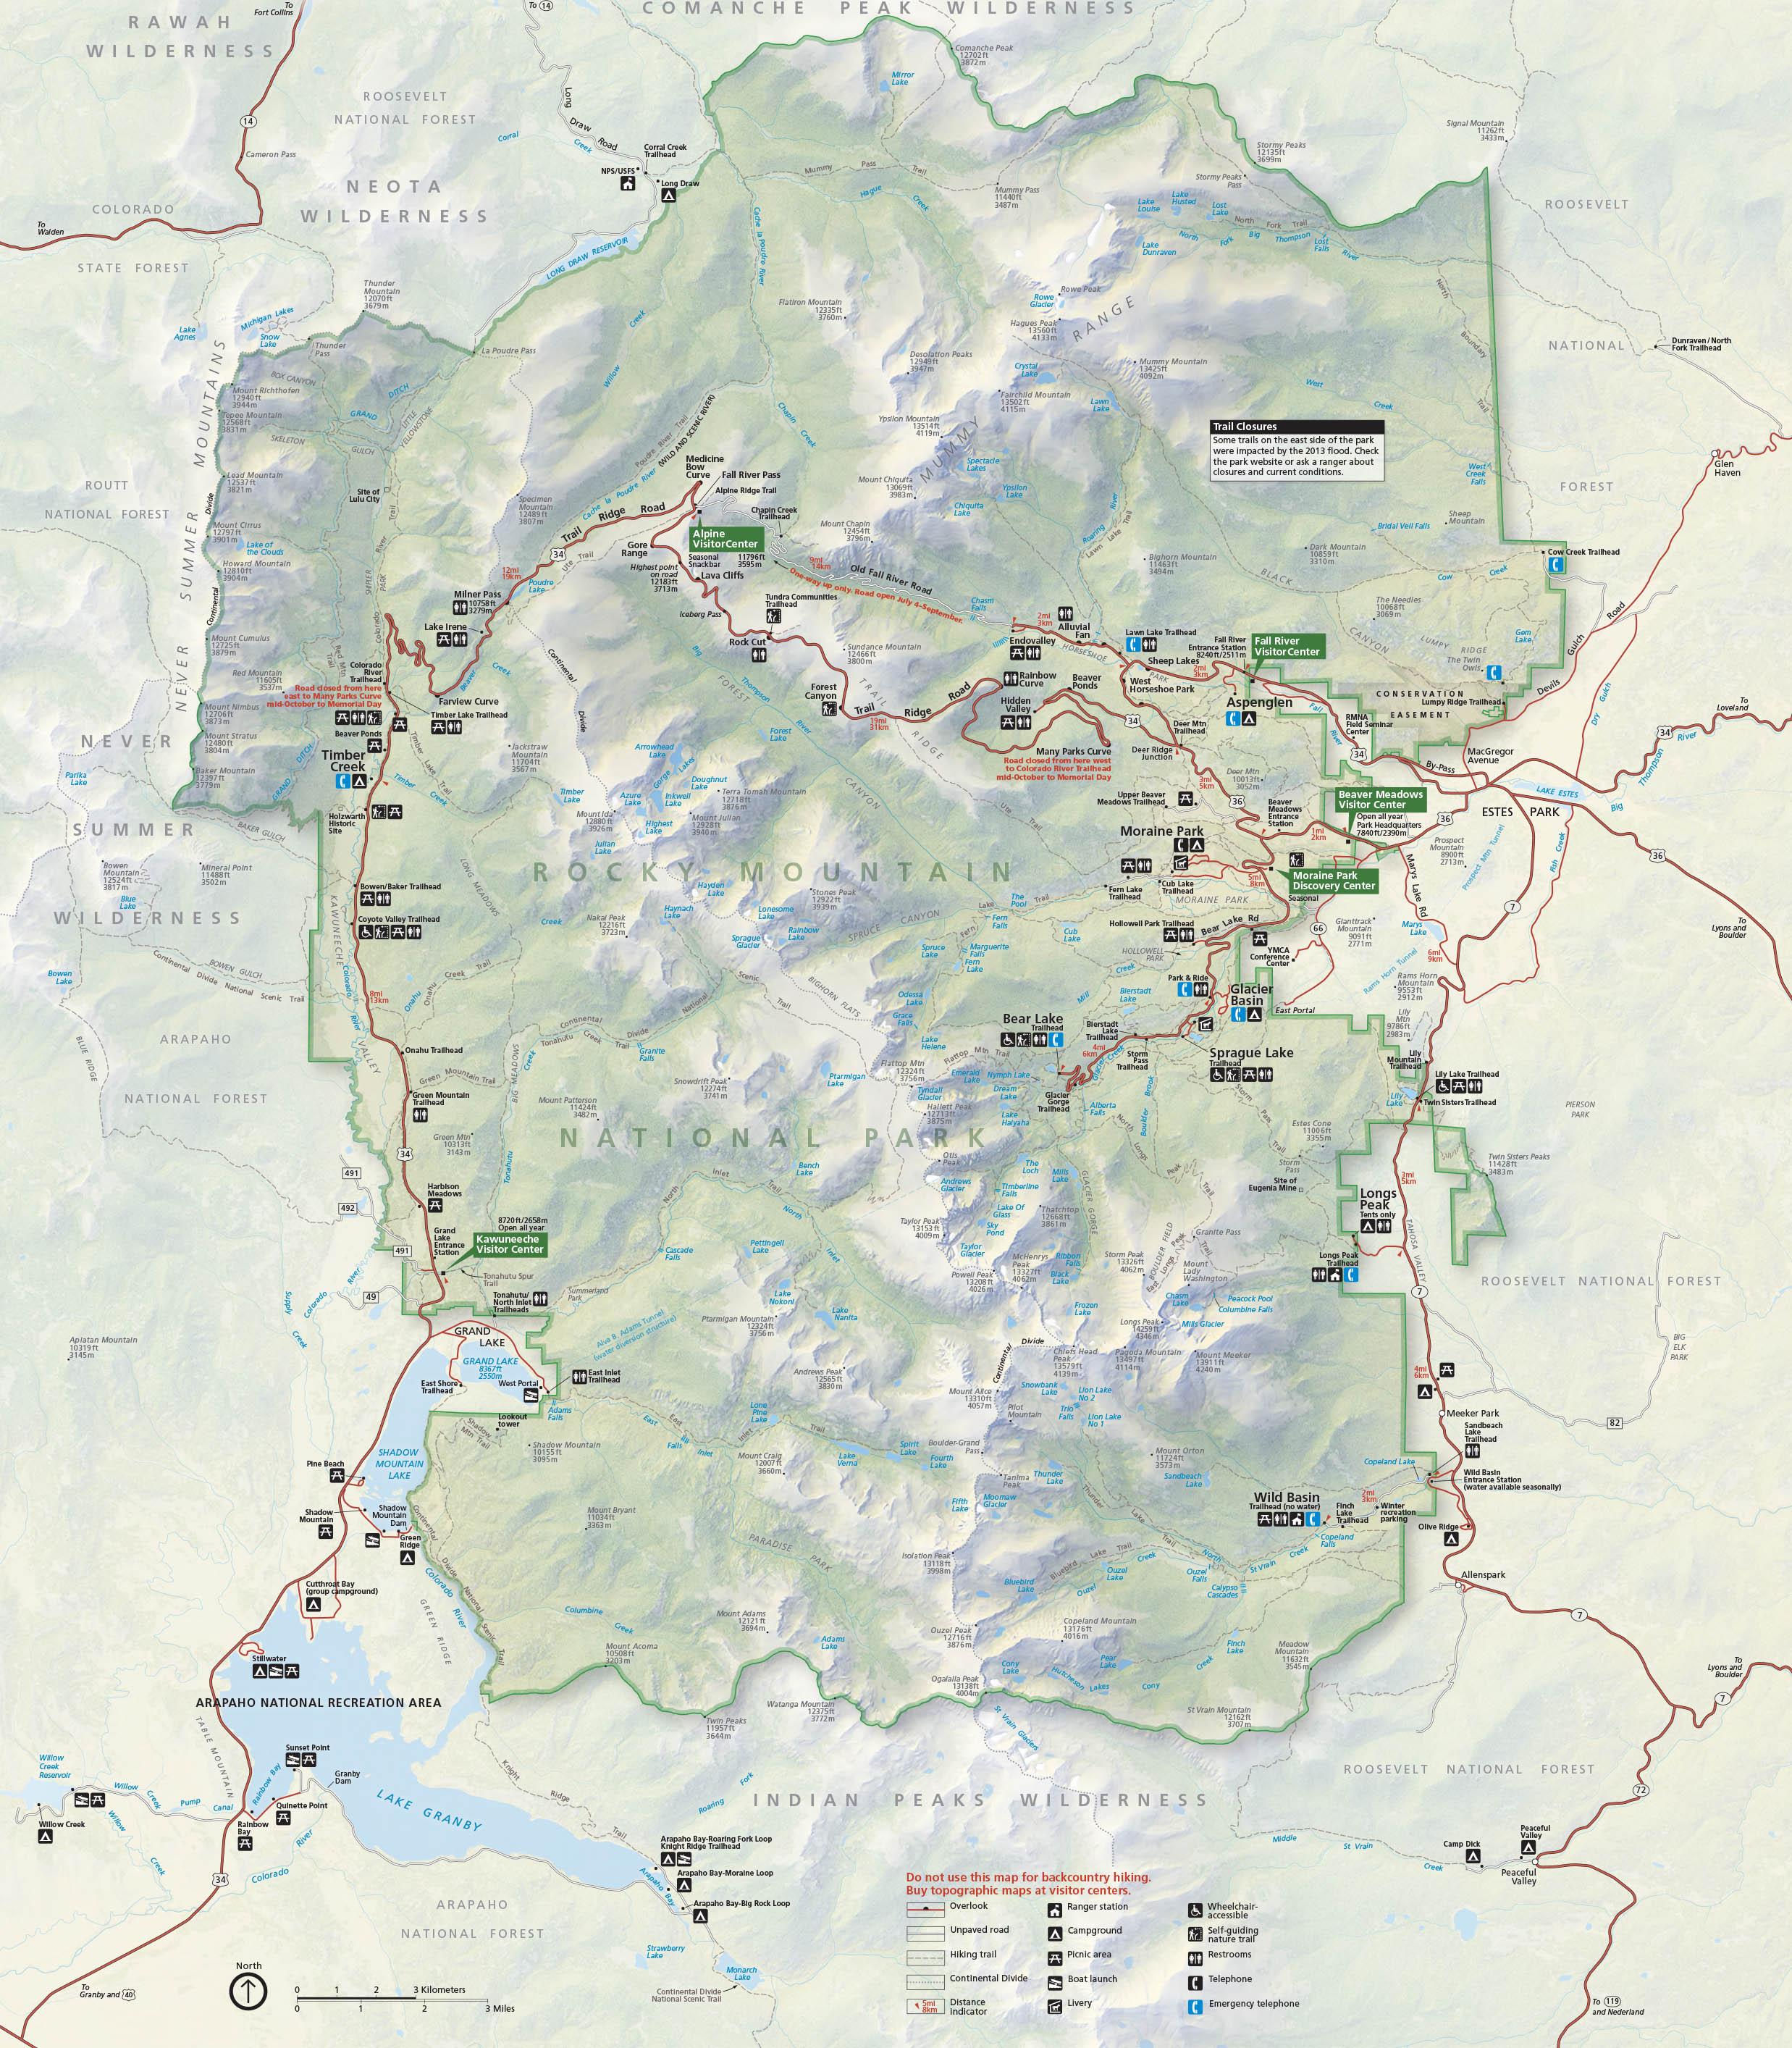 Brochures - Rocky Mountain National Park (U.S. National Park Service)